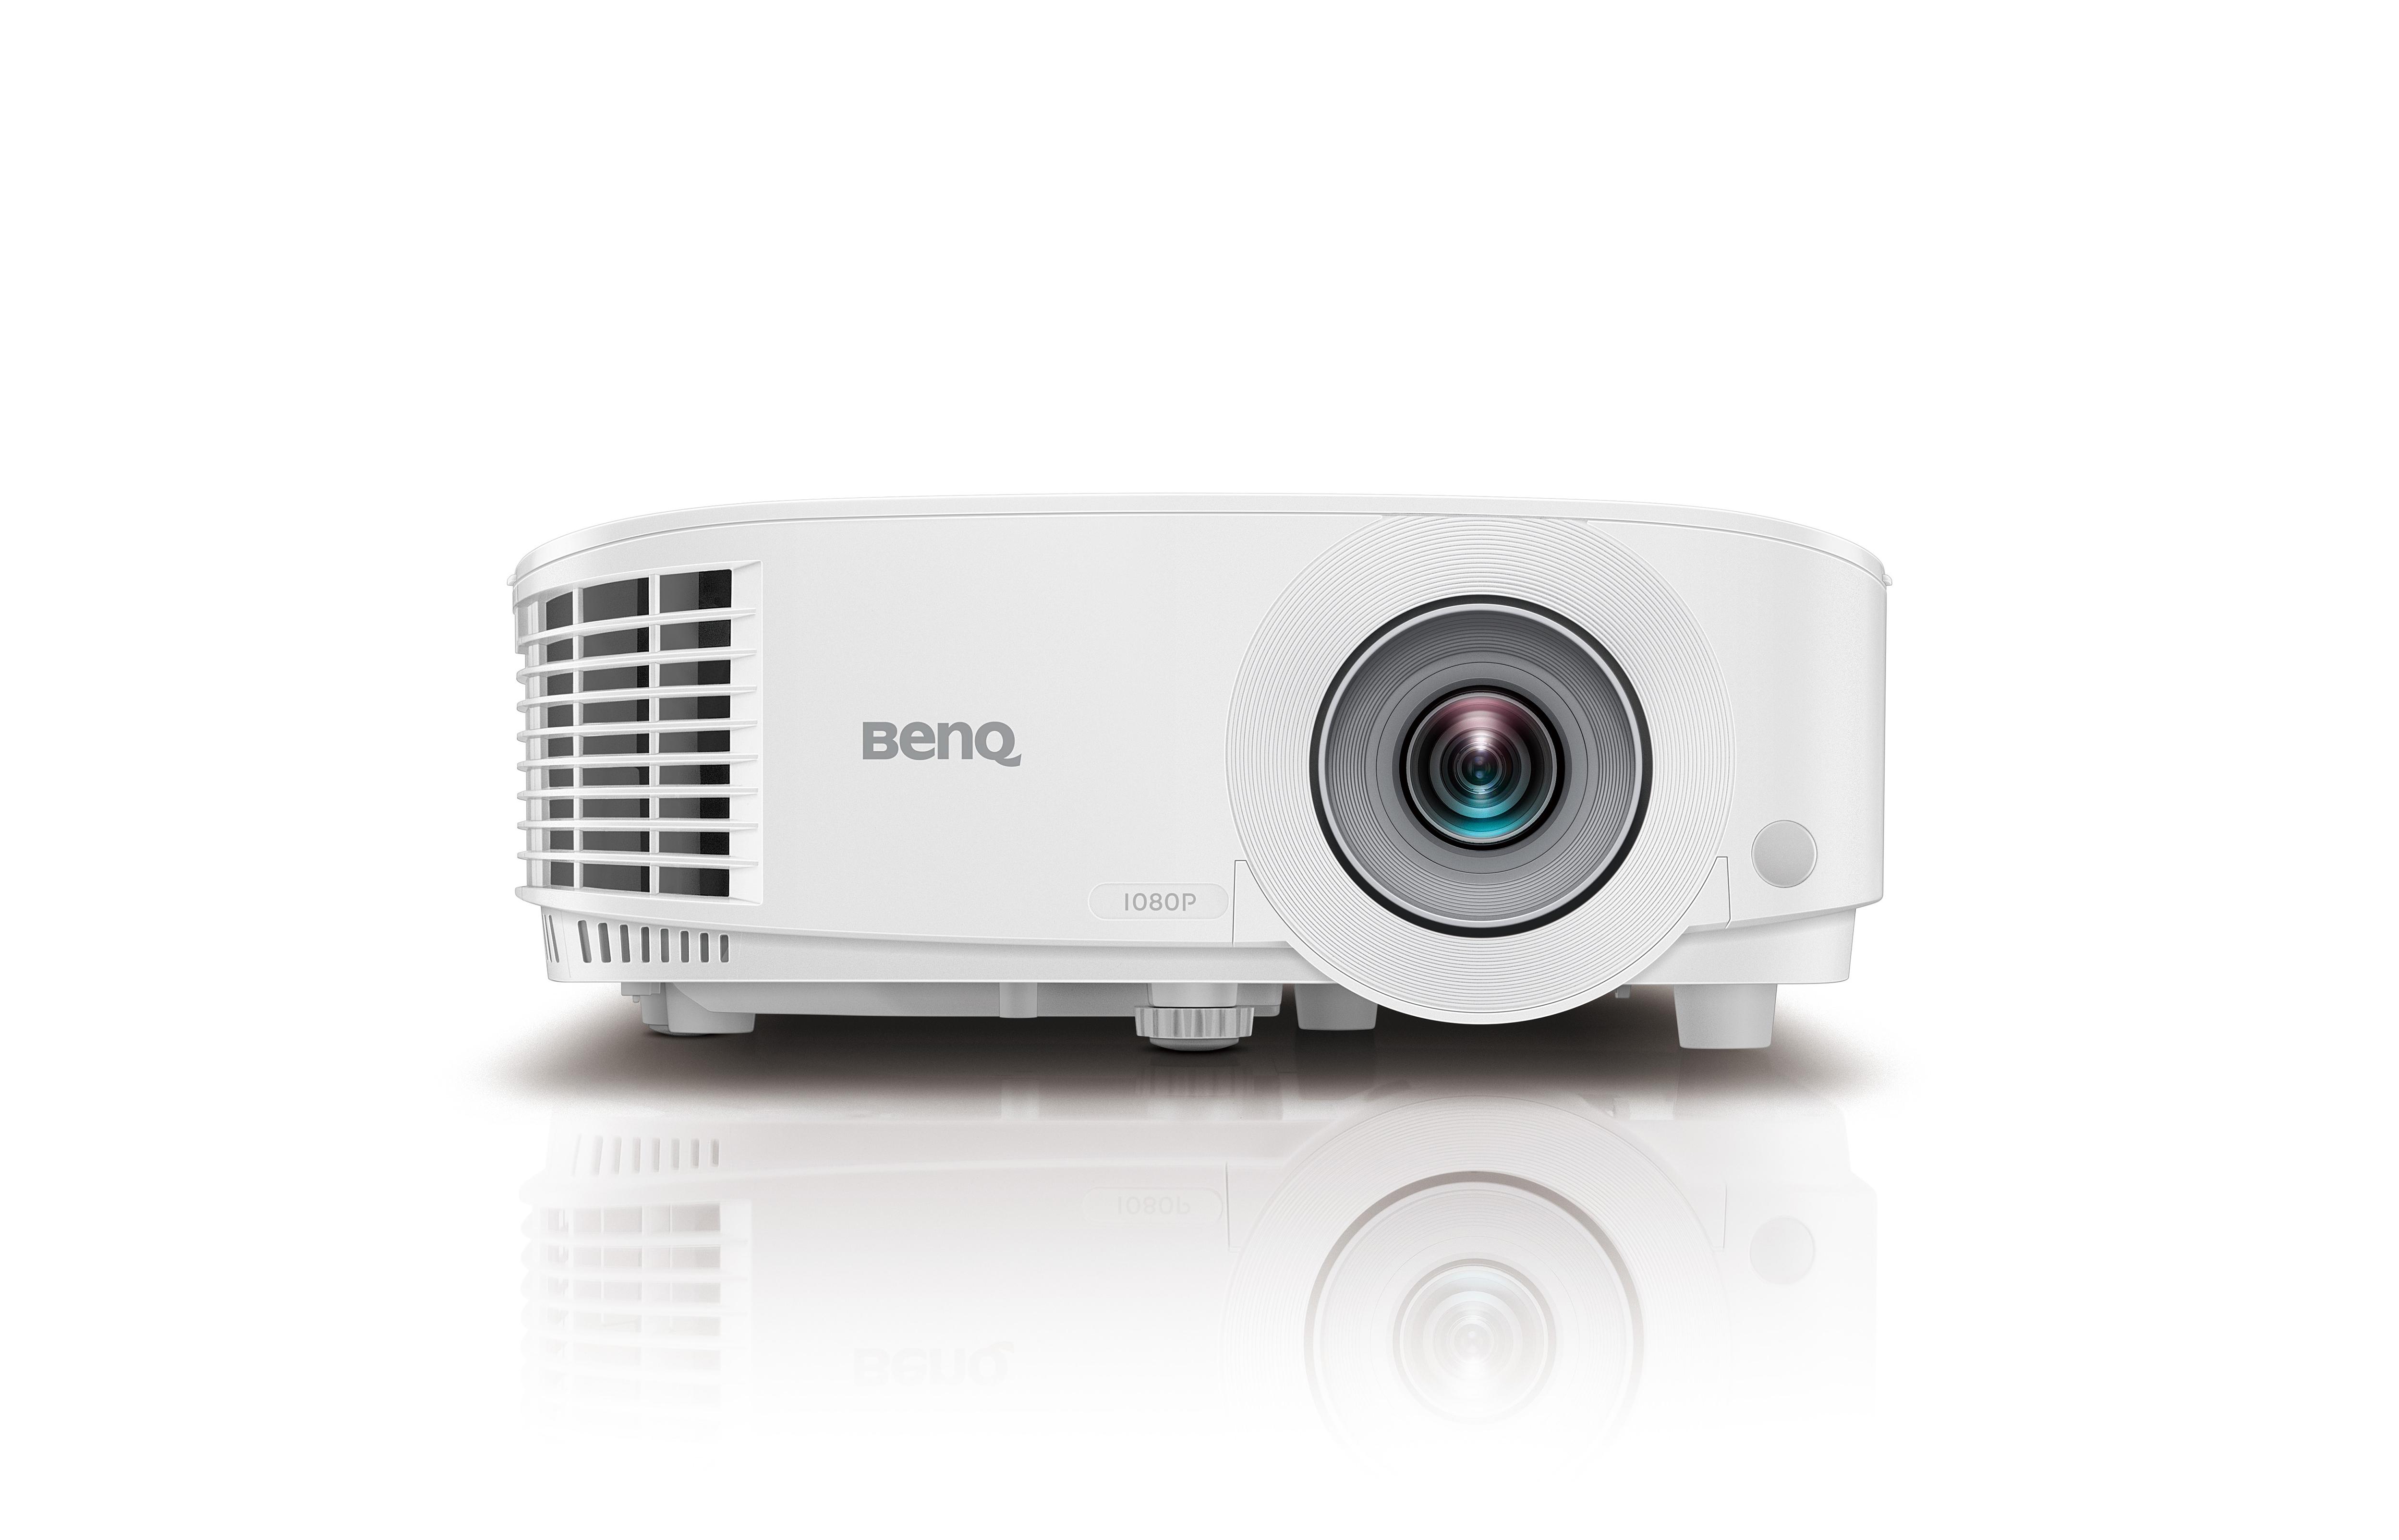 BenQ MH733 4000lm Full HD DLP Business Projector